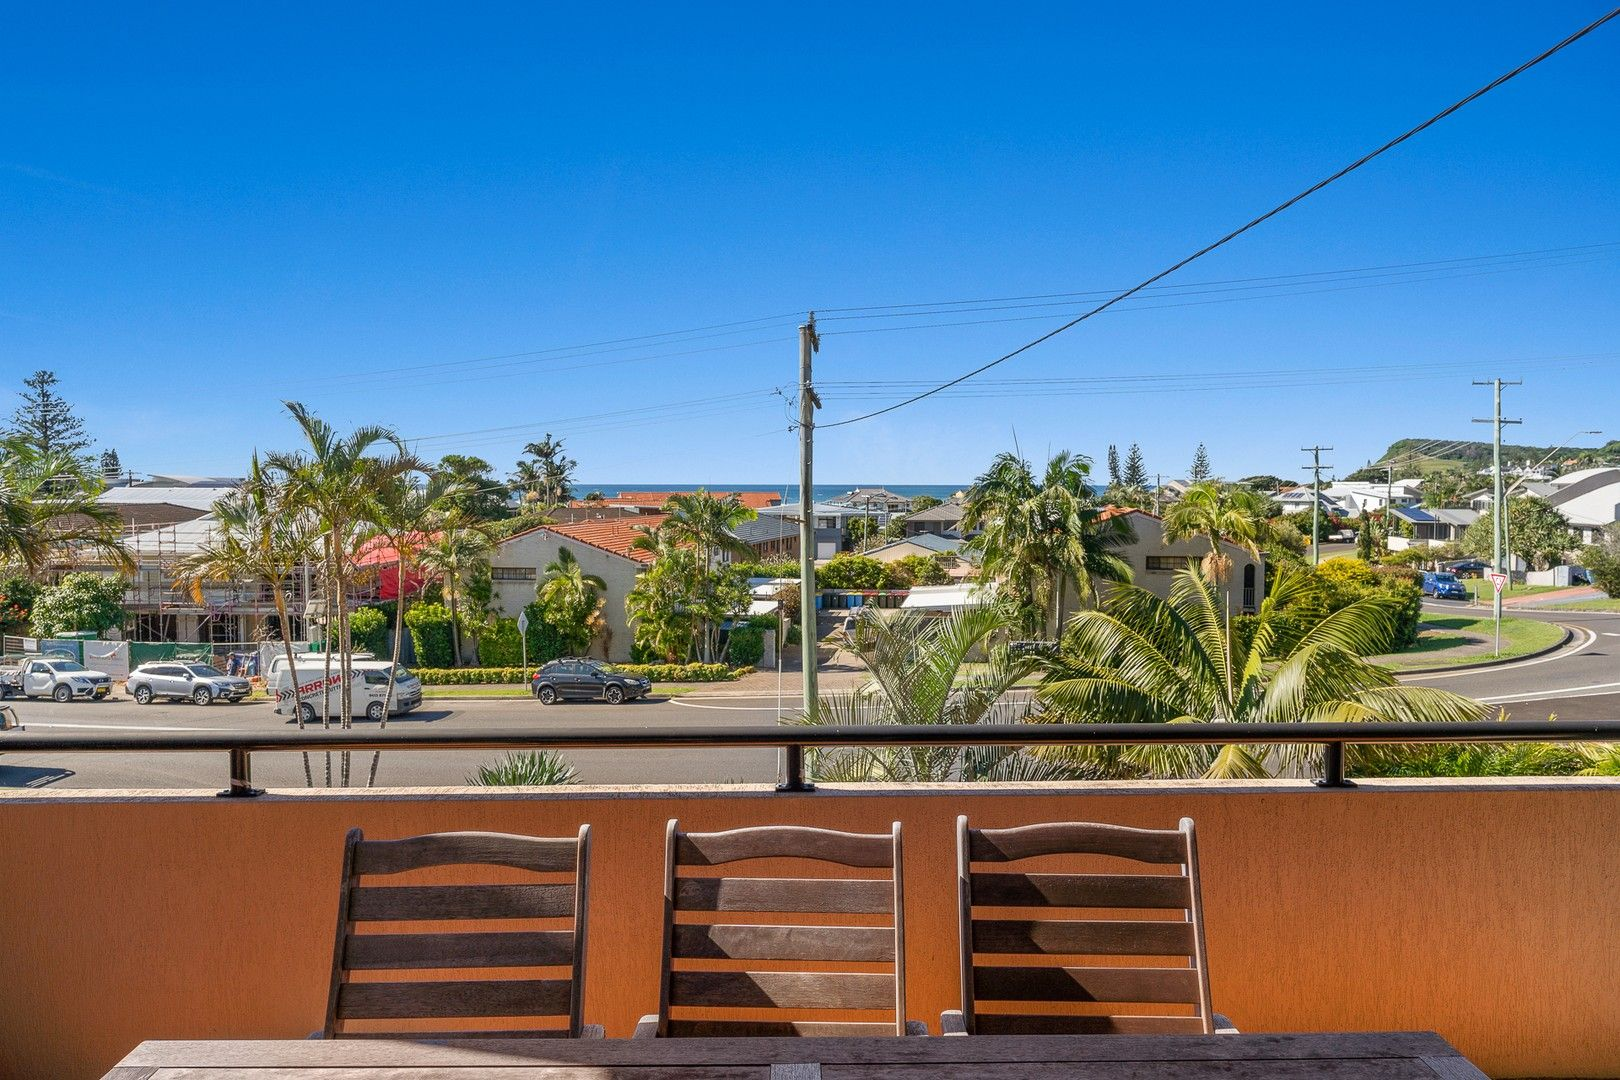 2/32 Ballina  Street, Lennox Head NSW 2478, Image 0